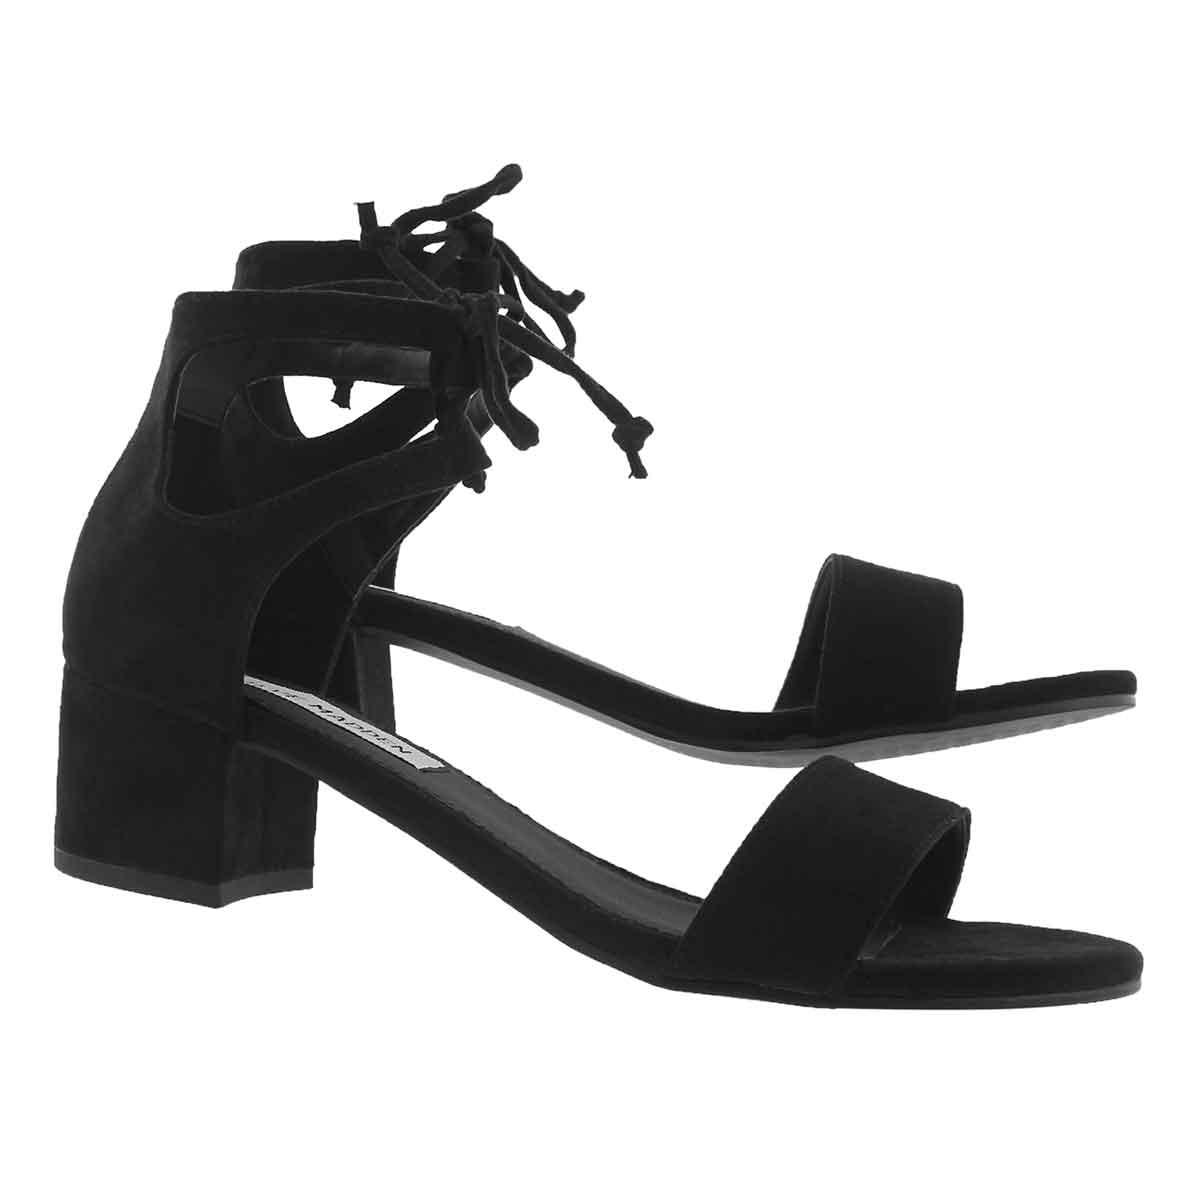 Lds Fiesta black ankle strap dress sndl